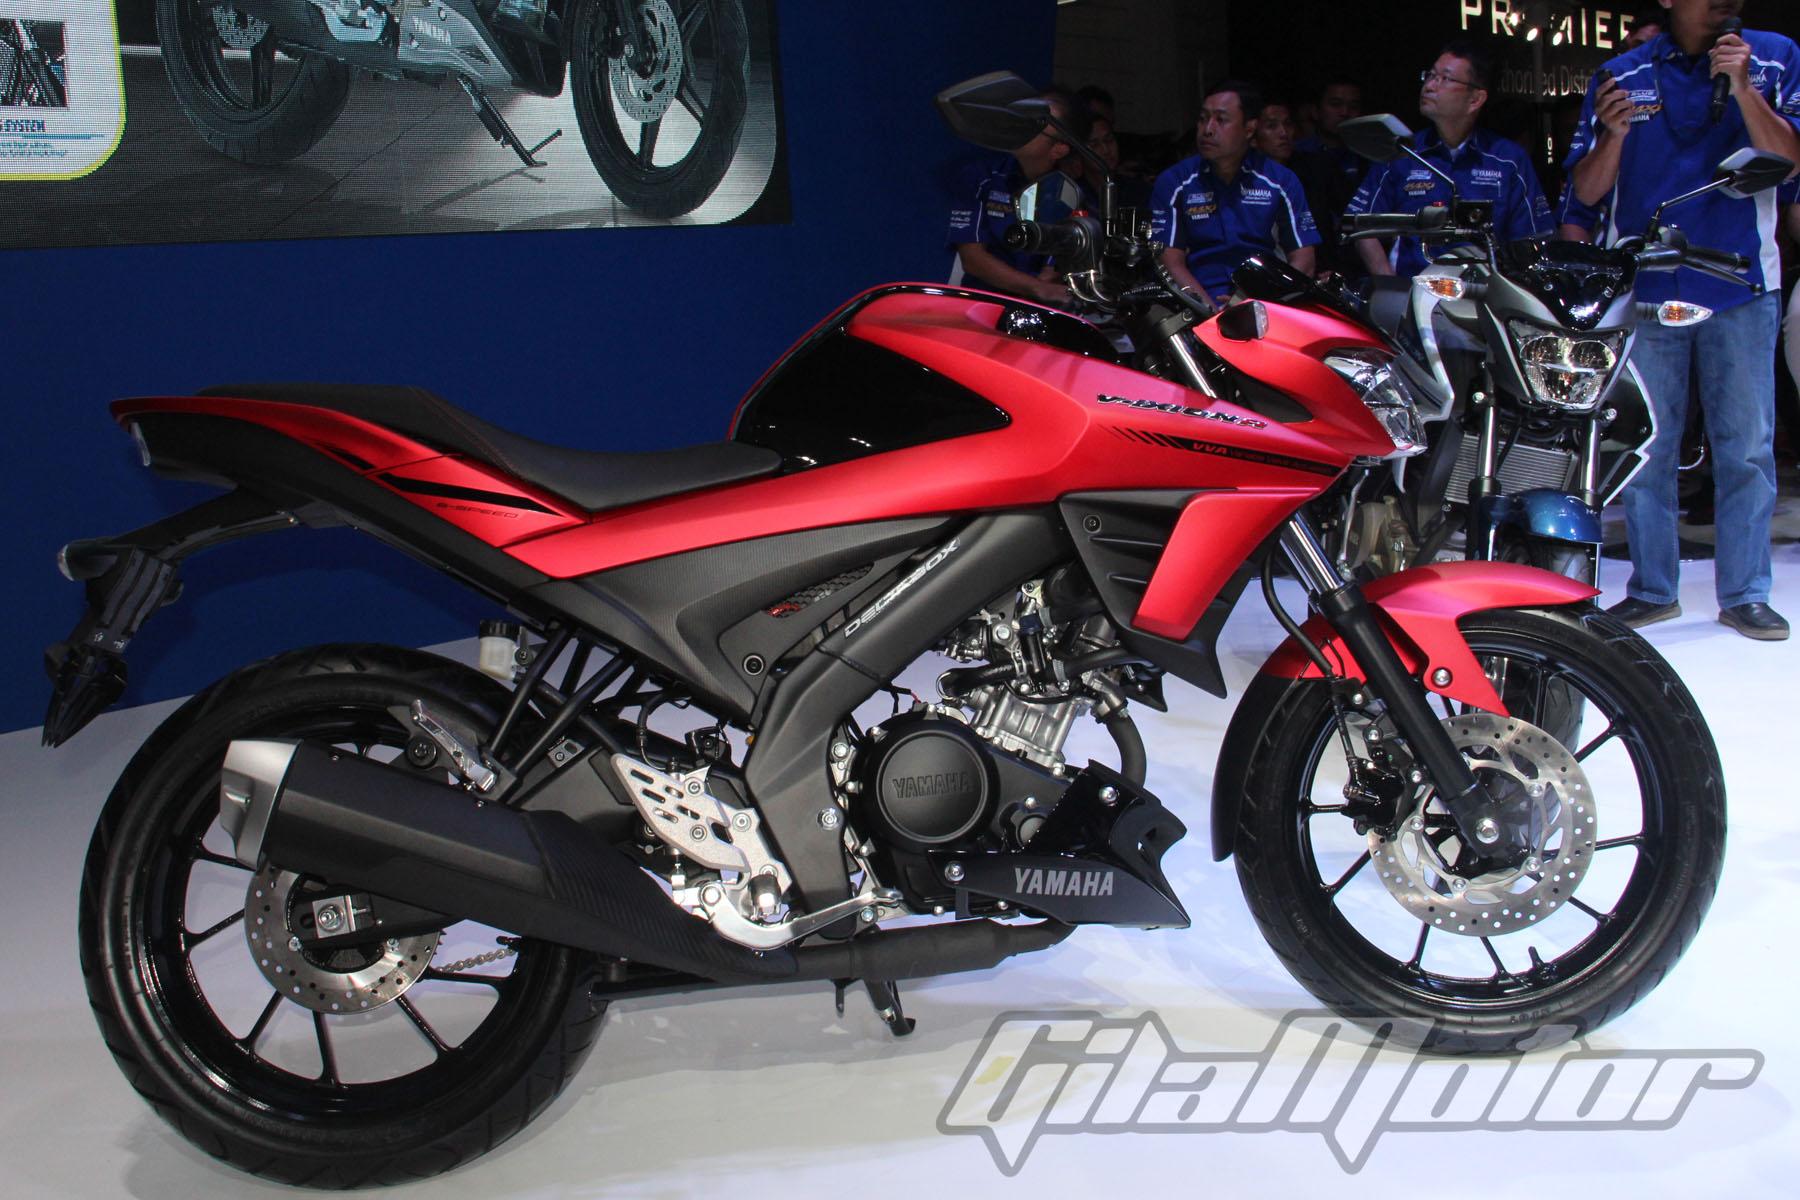 Harga Yamaha V Ixion R Lebih Murah Dari Perkiraan Gilamotor